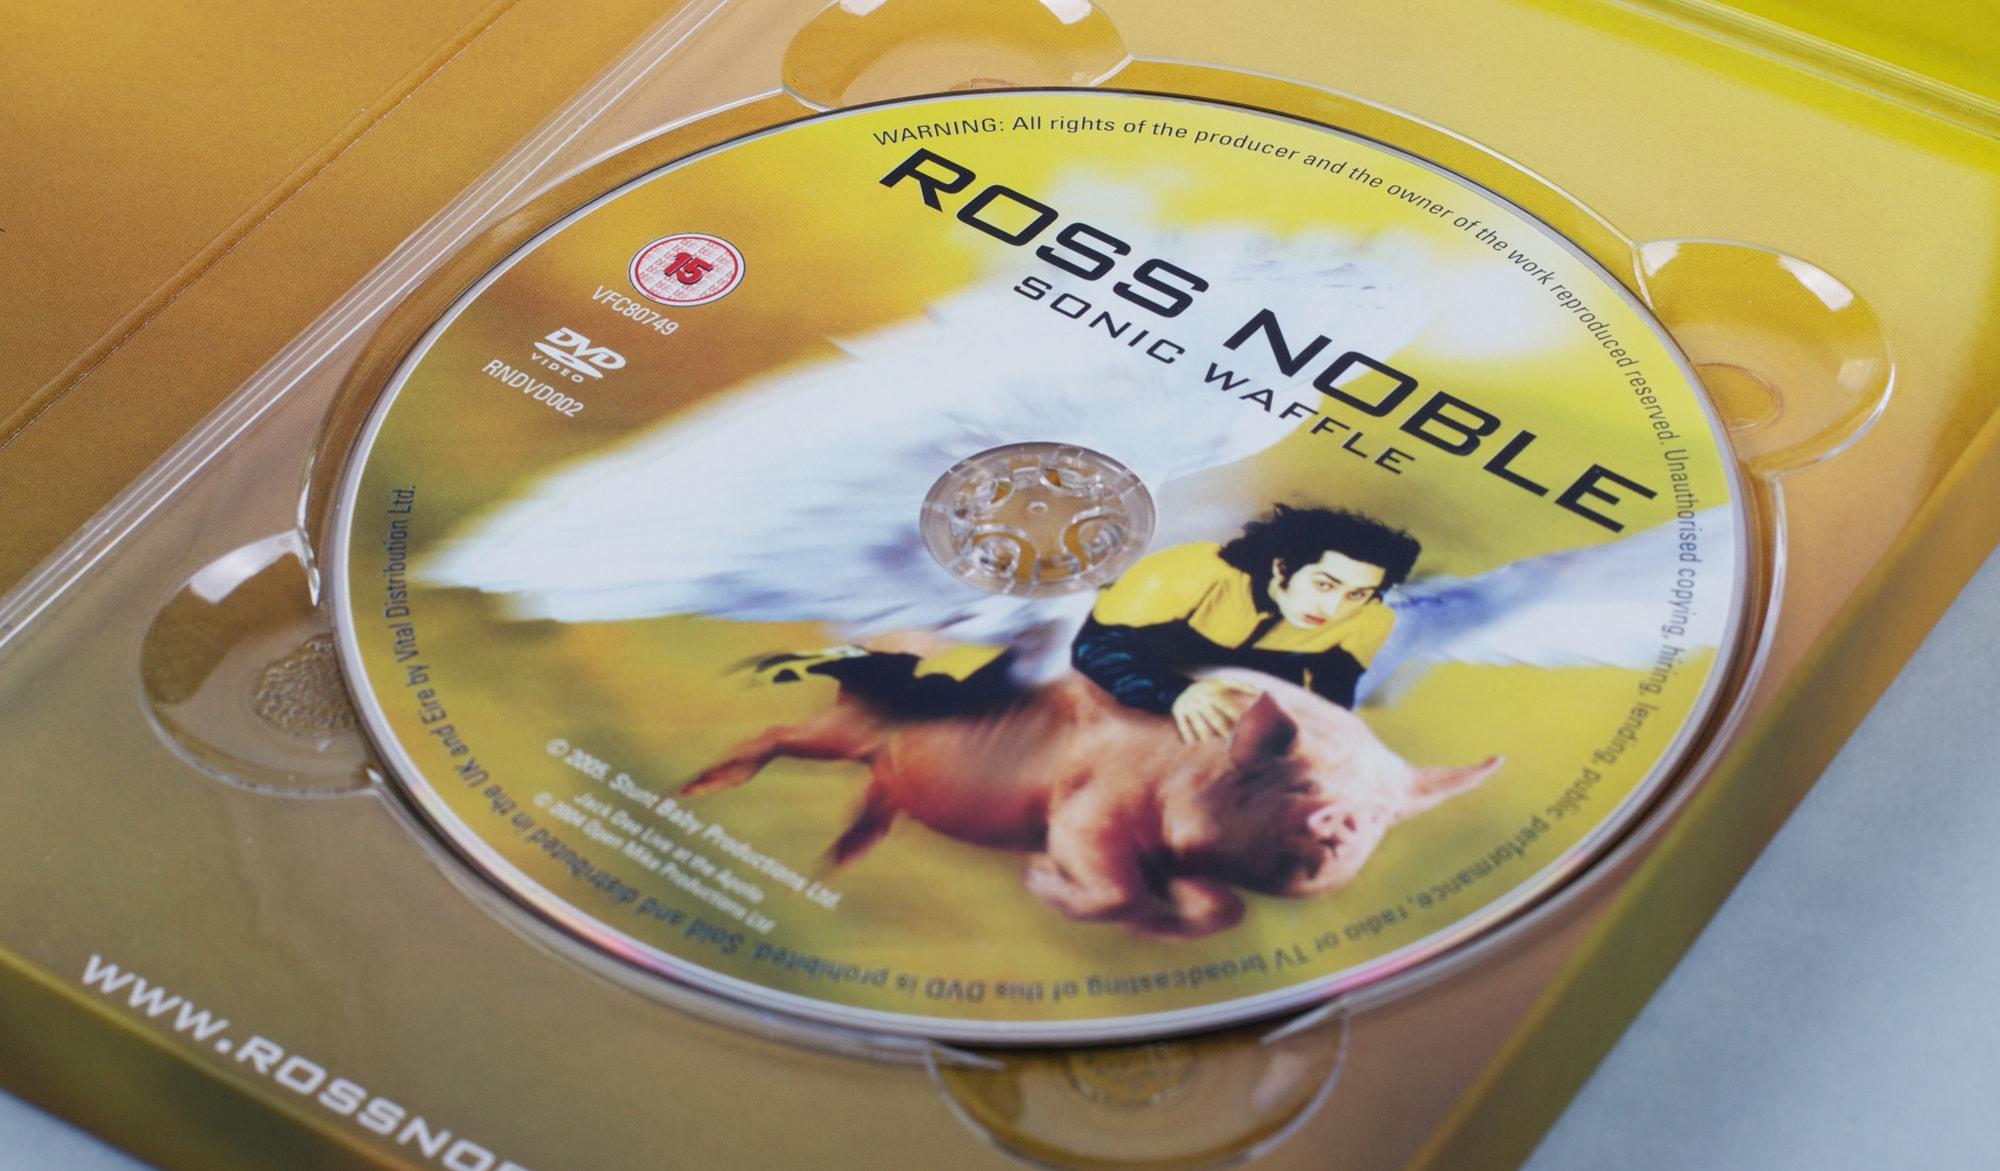 Ross Noble - Sonic Waffle DVD - inside